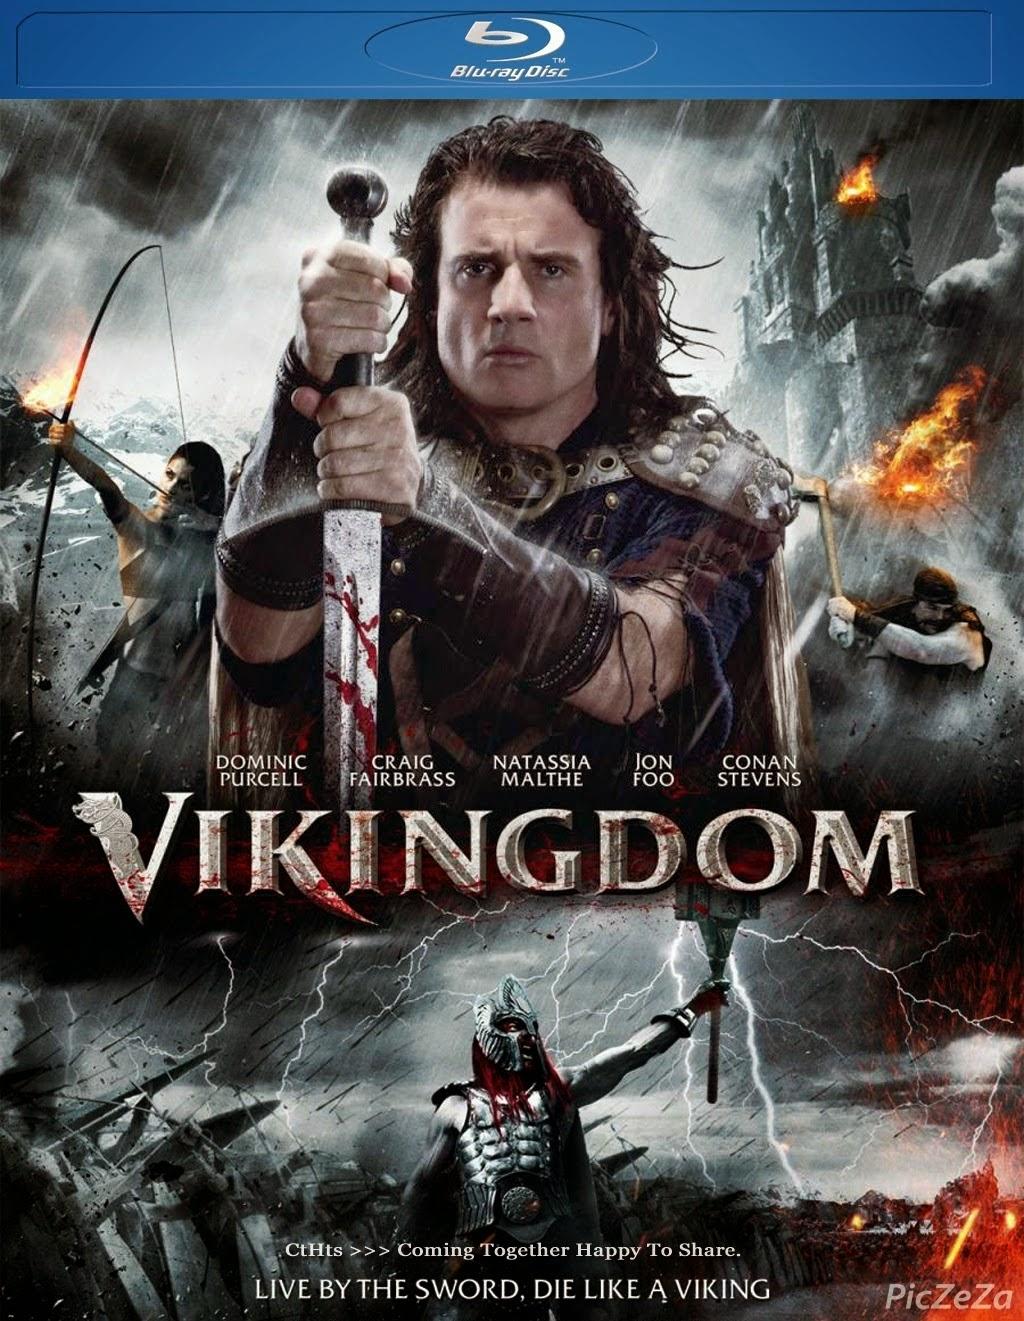 Vikingdom (2013) : มหาศึกพิภพสยบเทพเจ้า